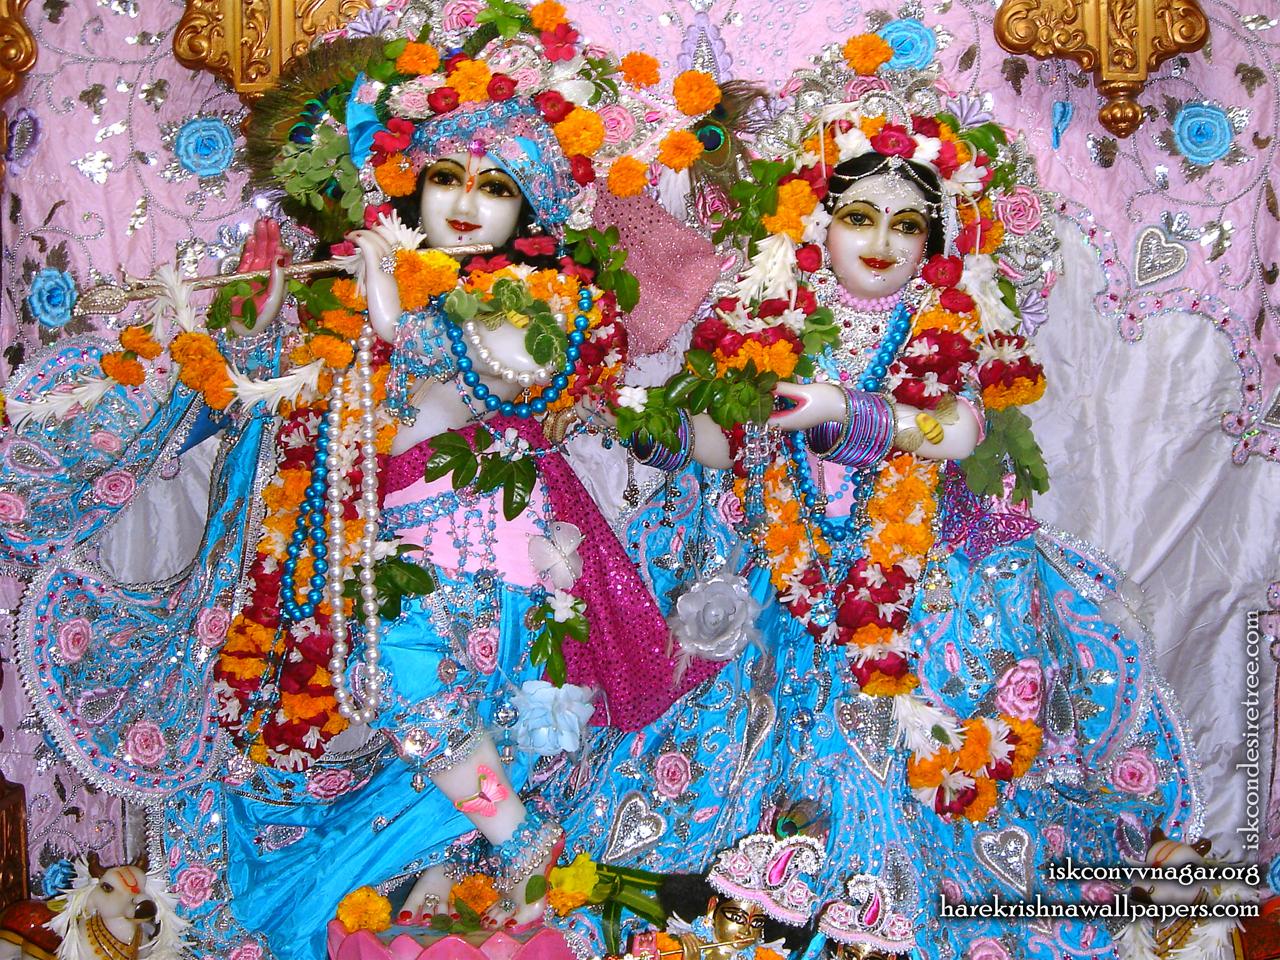 Sri Sri Radha Giridhari Wallpaper (019) Size 1280x960 Download